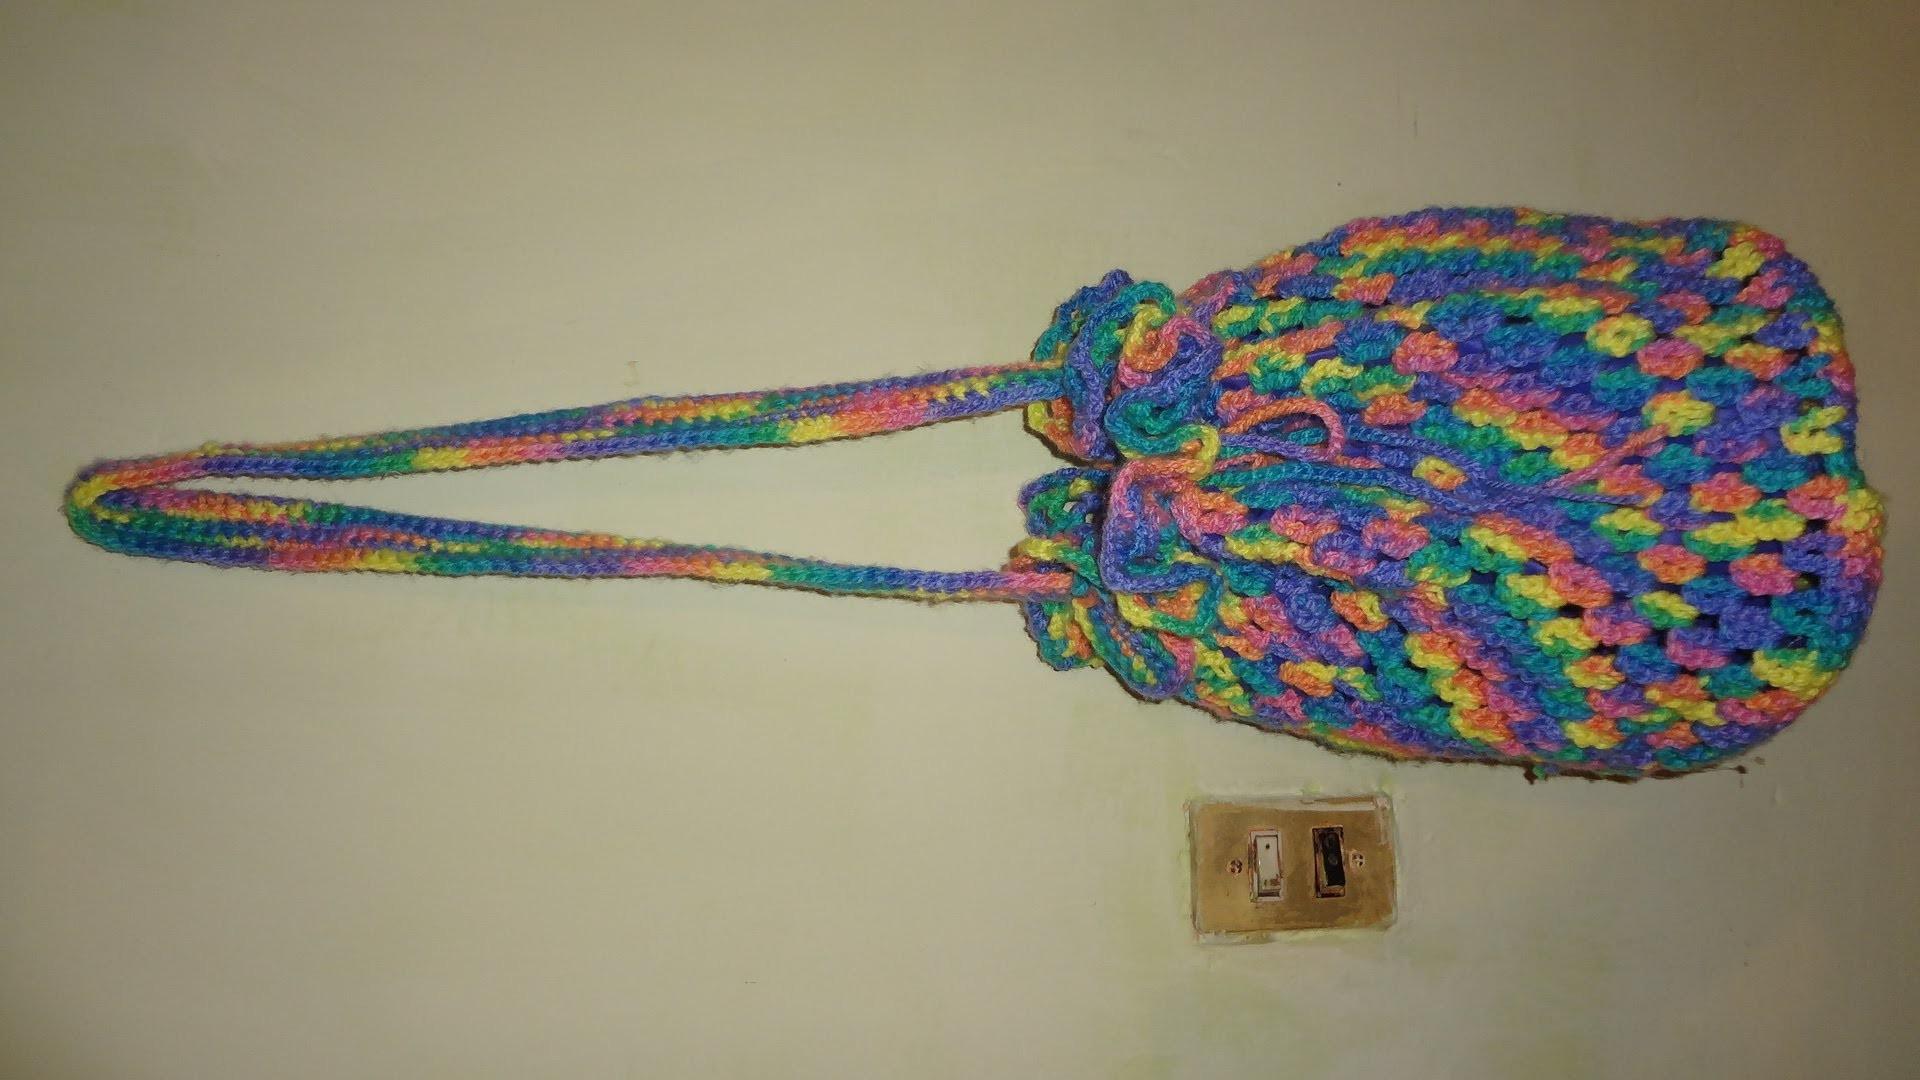 Bolsa tejida de colores  segunda parte   marimur 440